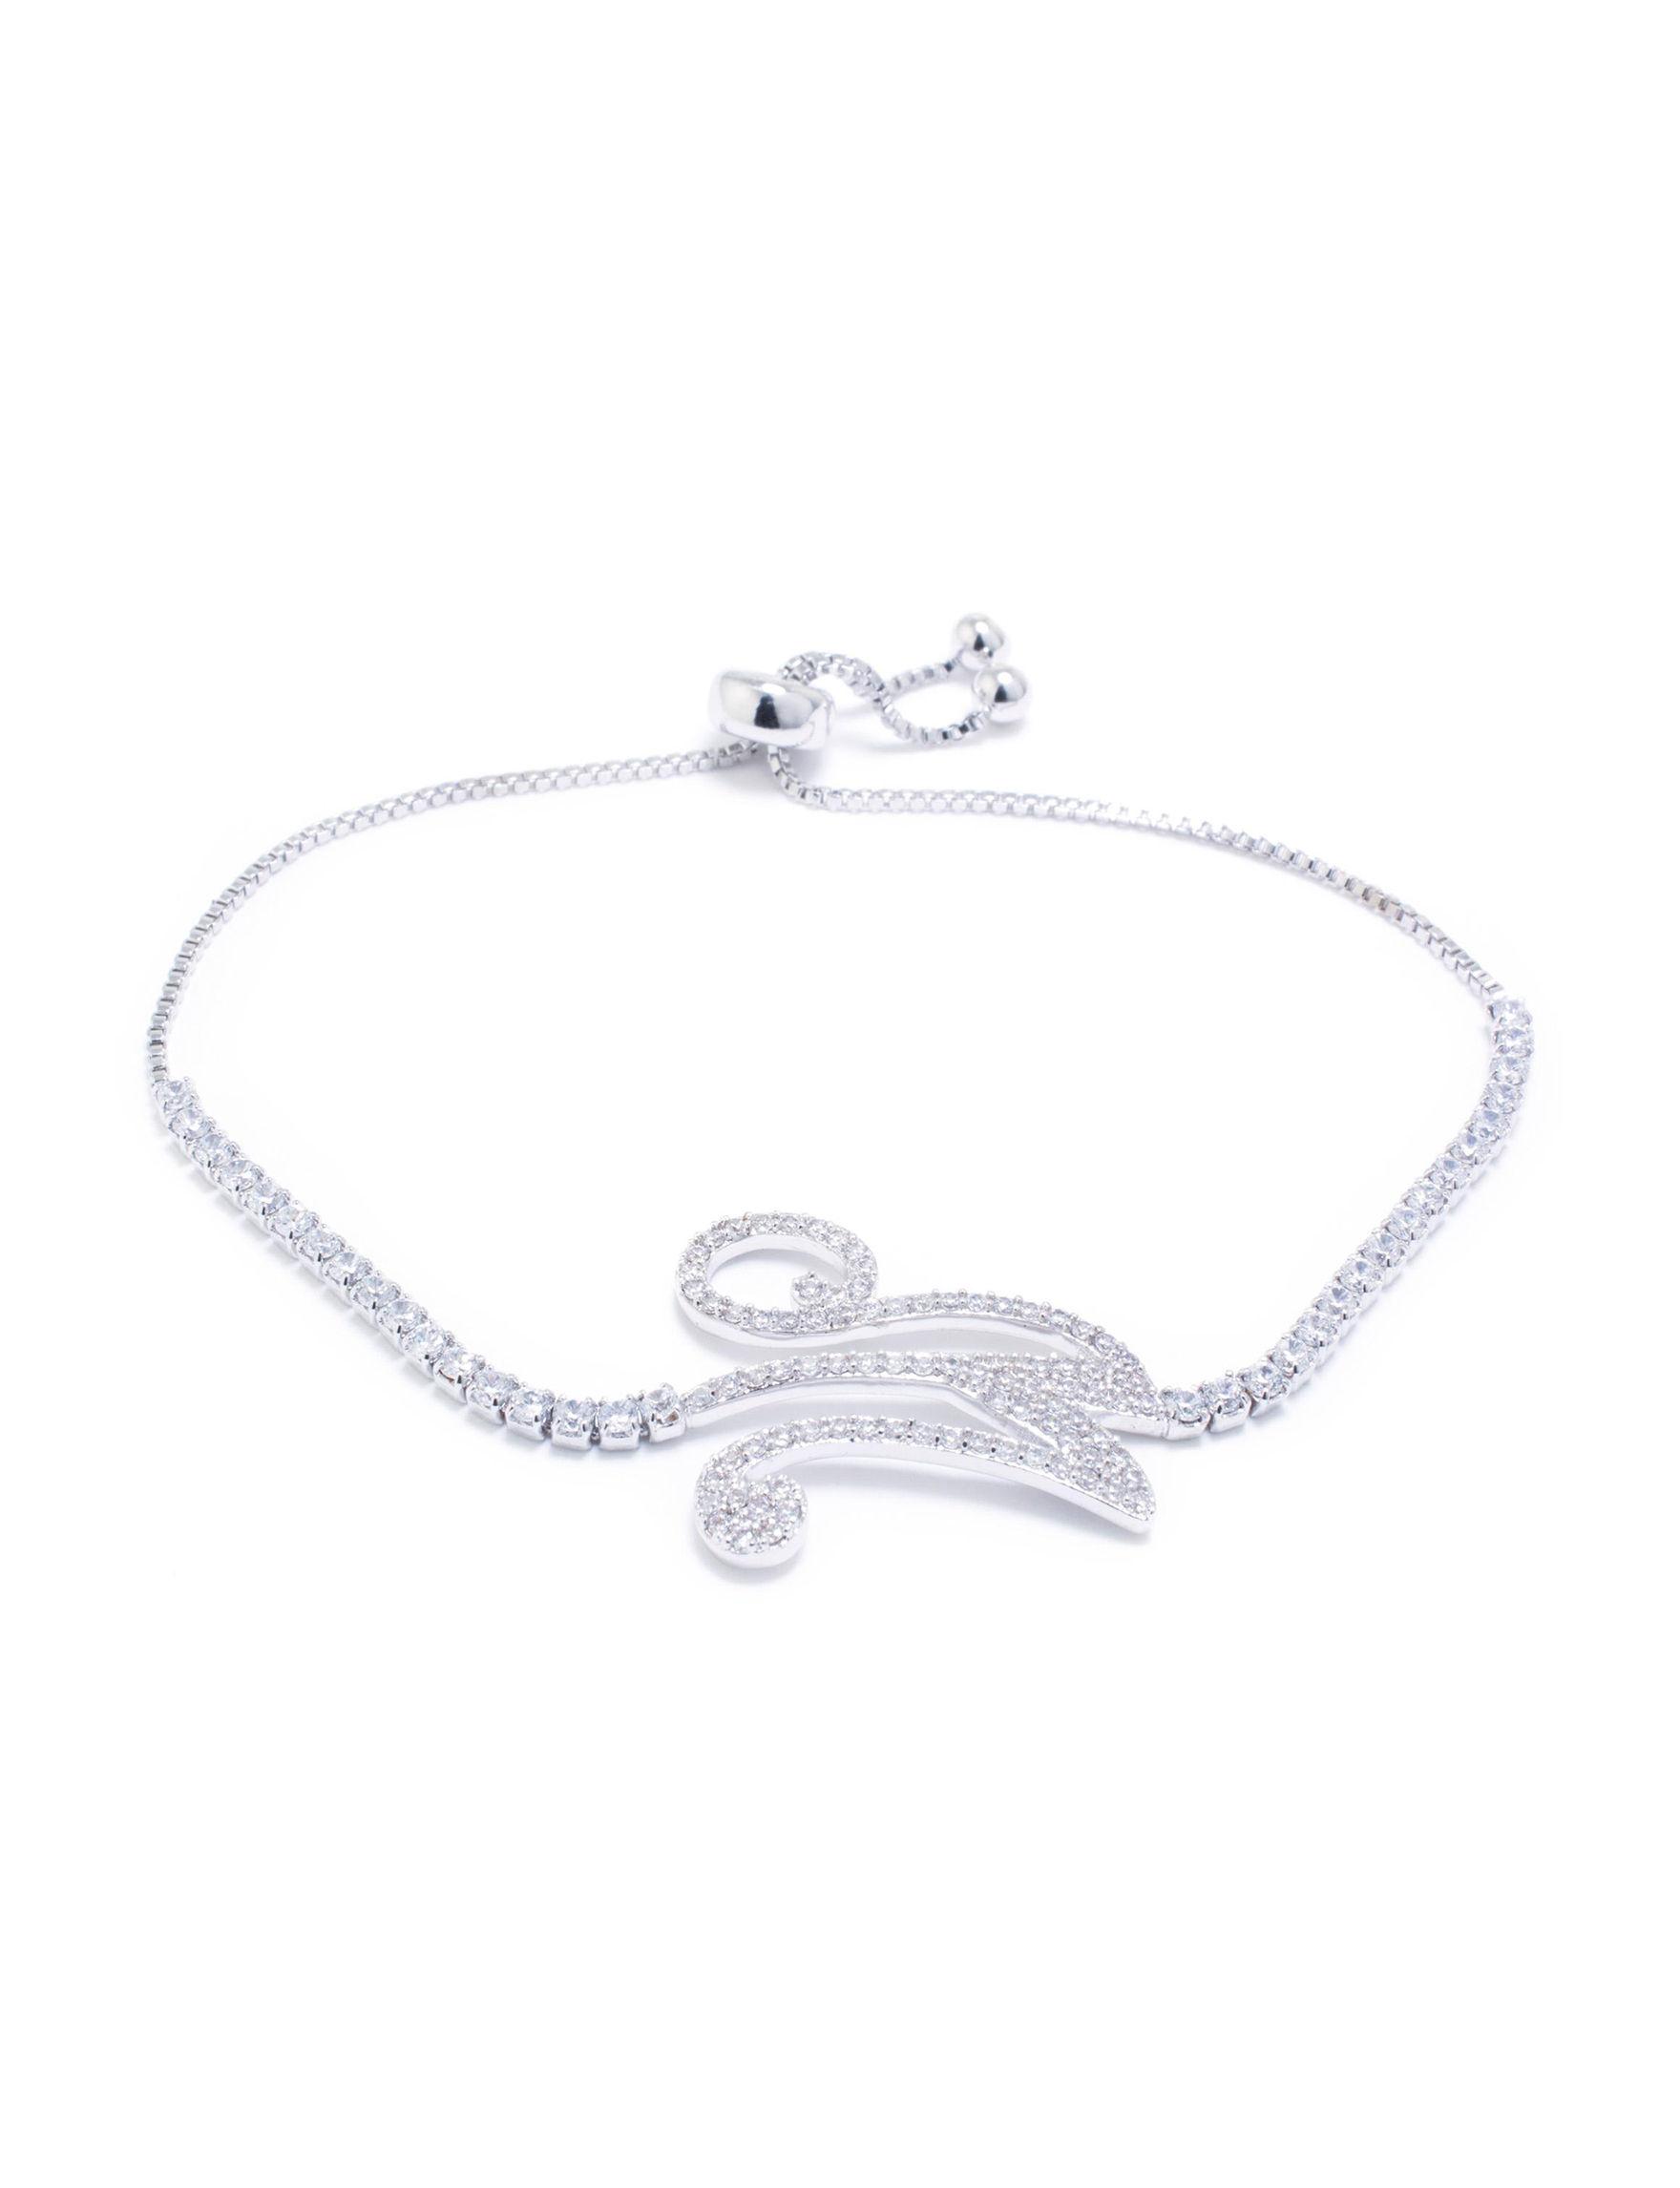 Athra Silver Bracelets Fine Jewelry